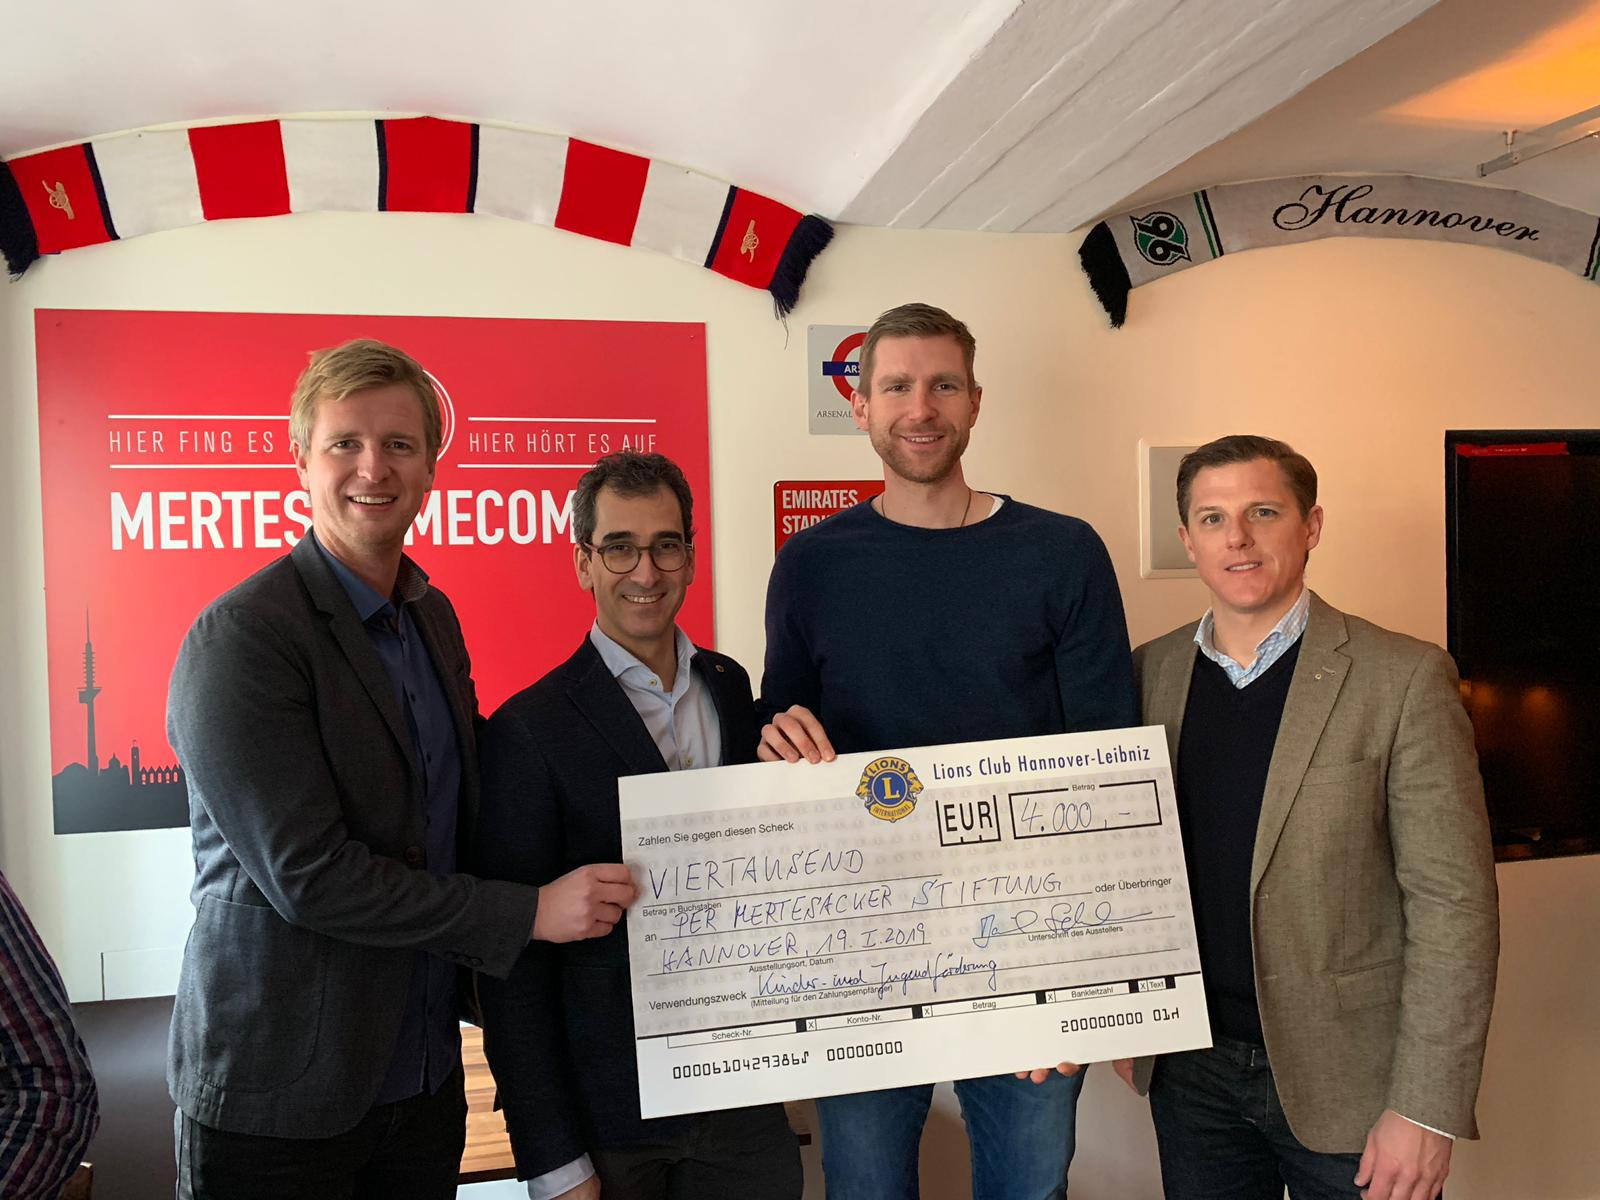 Lions Club Hannover-Leibniz spendet 4.000 €